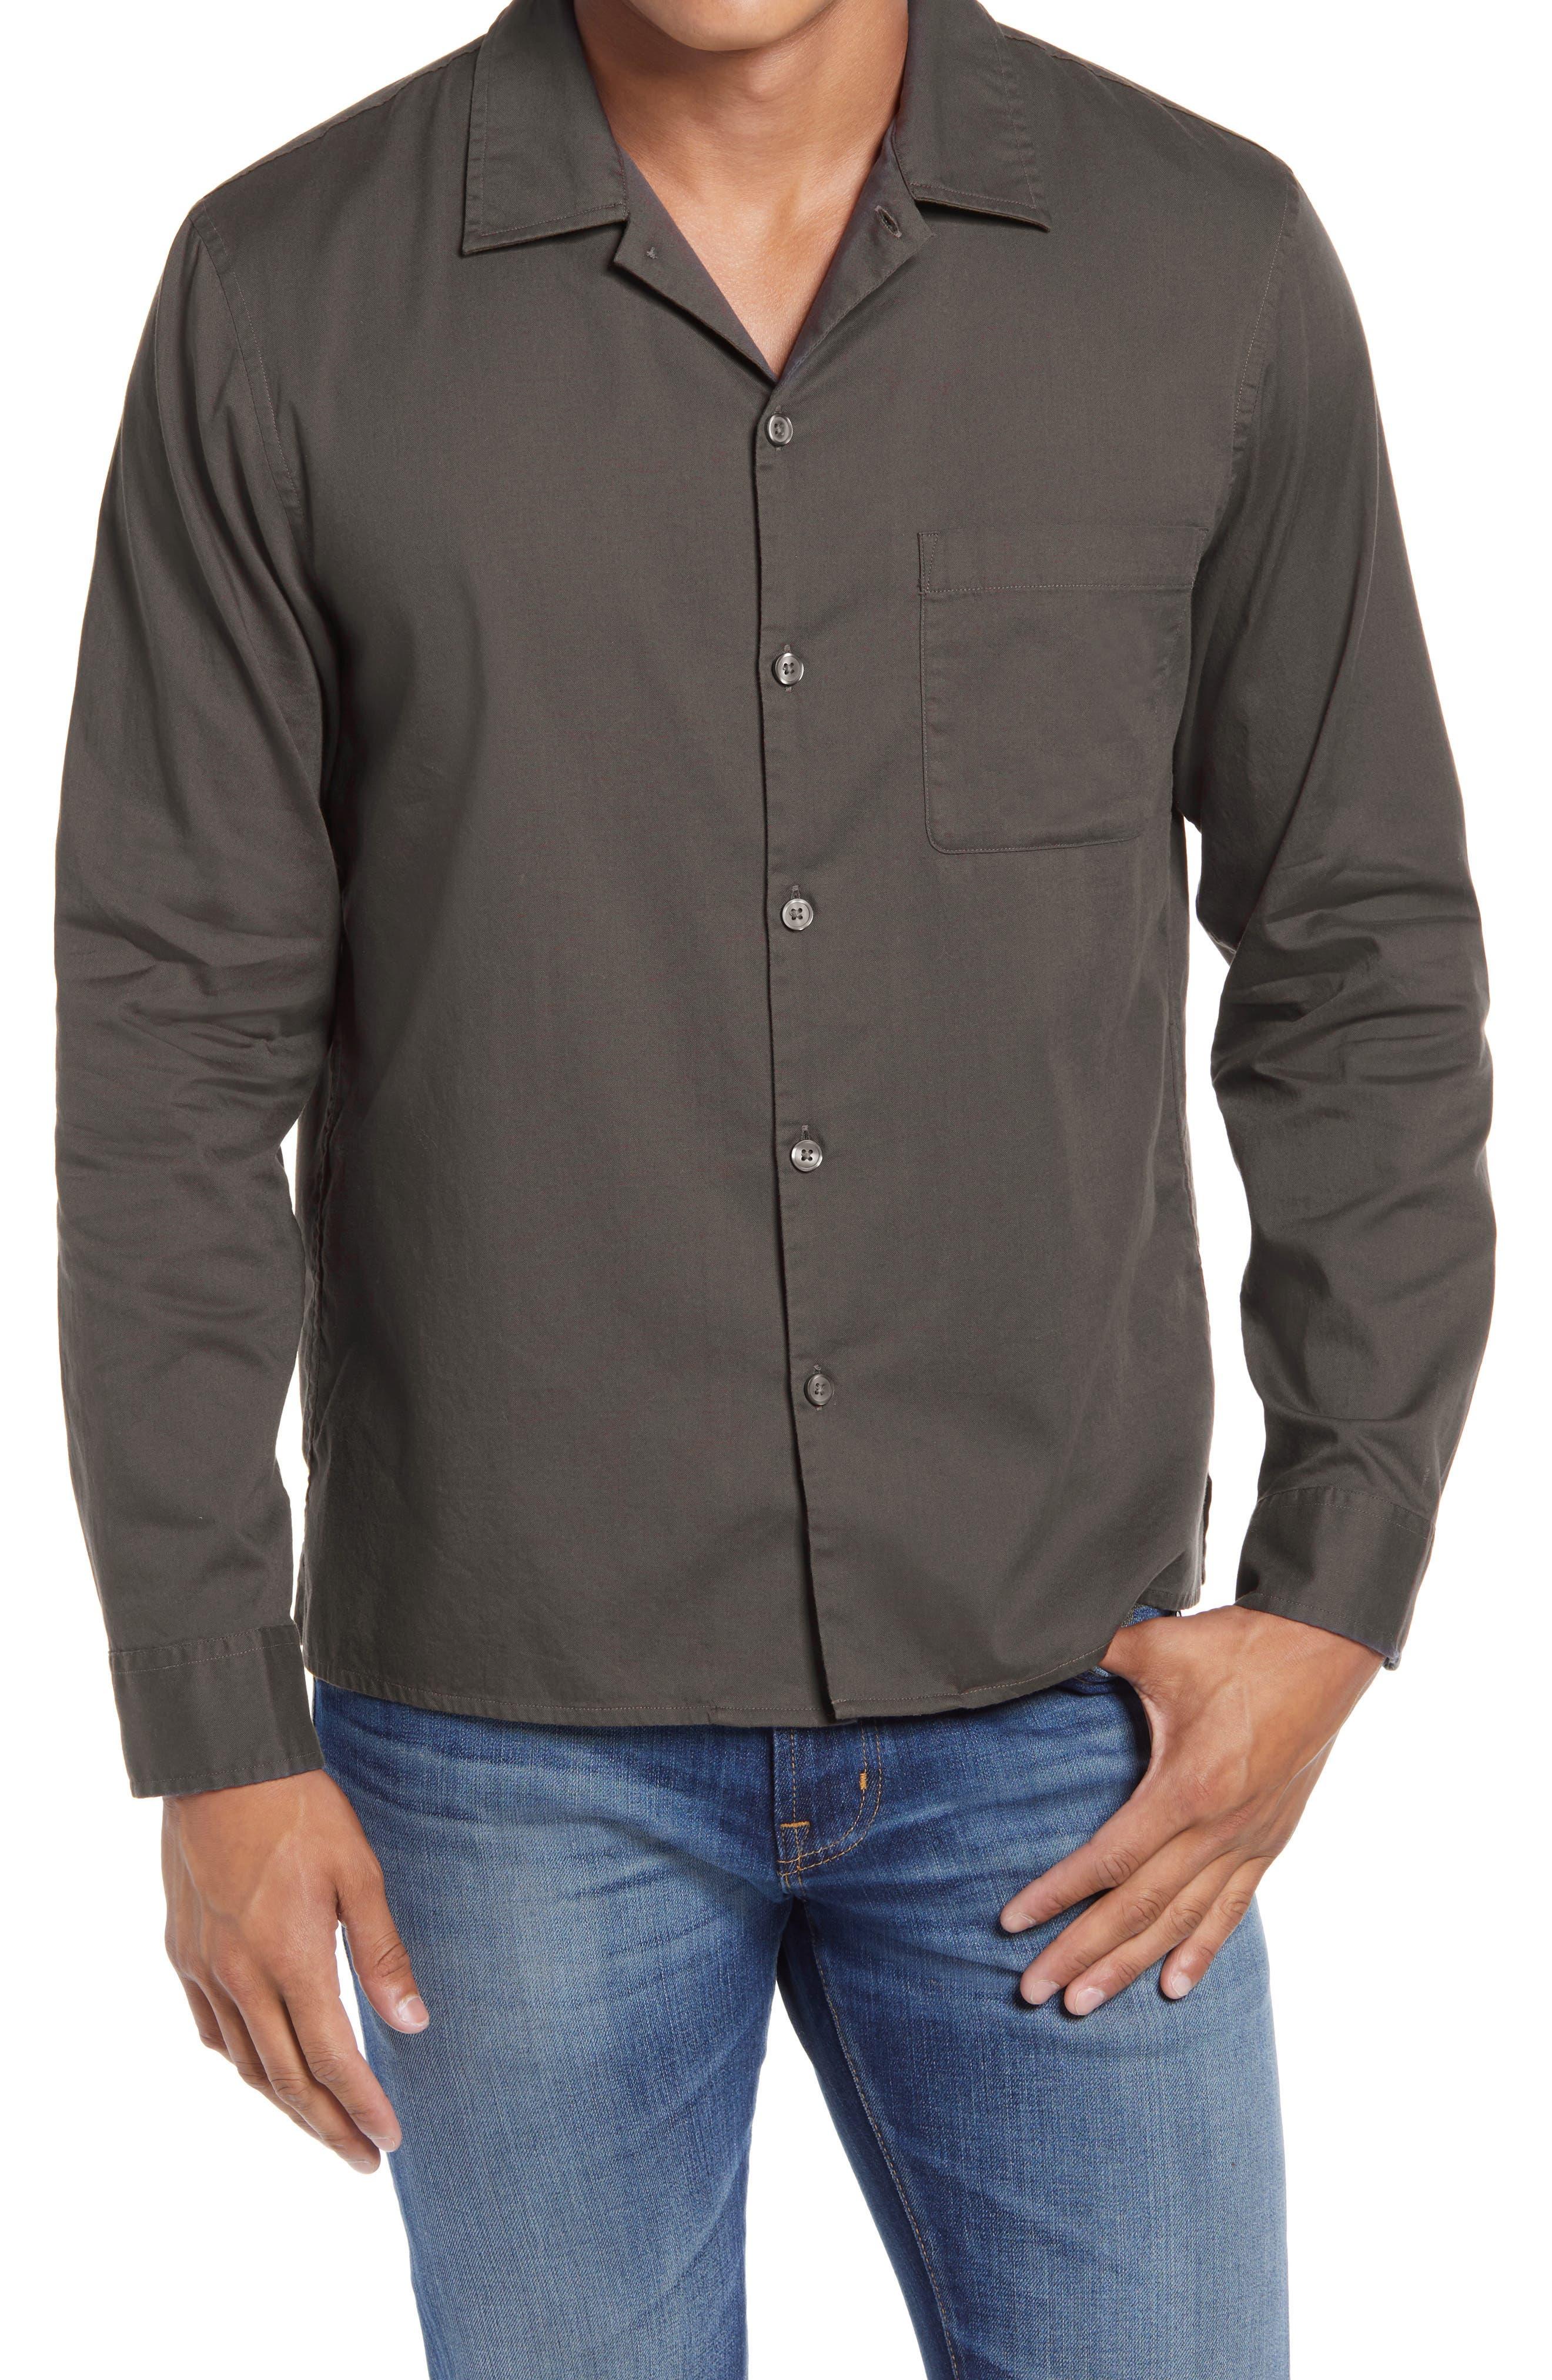 1950s Mens Shirts | Retro Bowling Shirts, Vintage Hawaiian Shirts Mens Club Monaco Standard Fit Solid Button-Up Camp Shirt Size XX-Large - Brown $62.65 AT vintagedancer.com